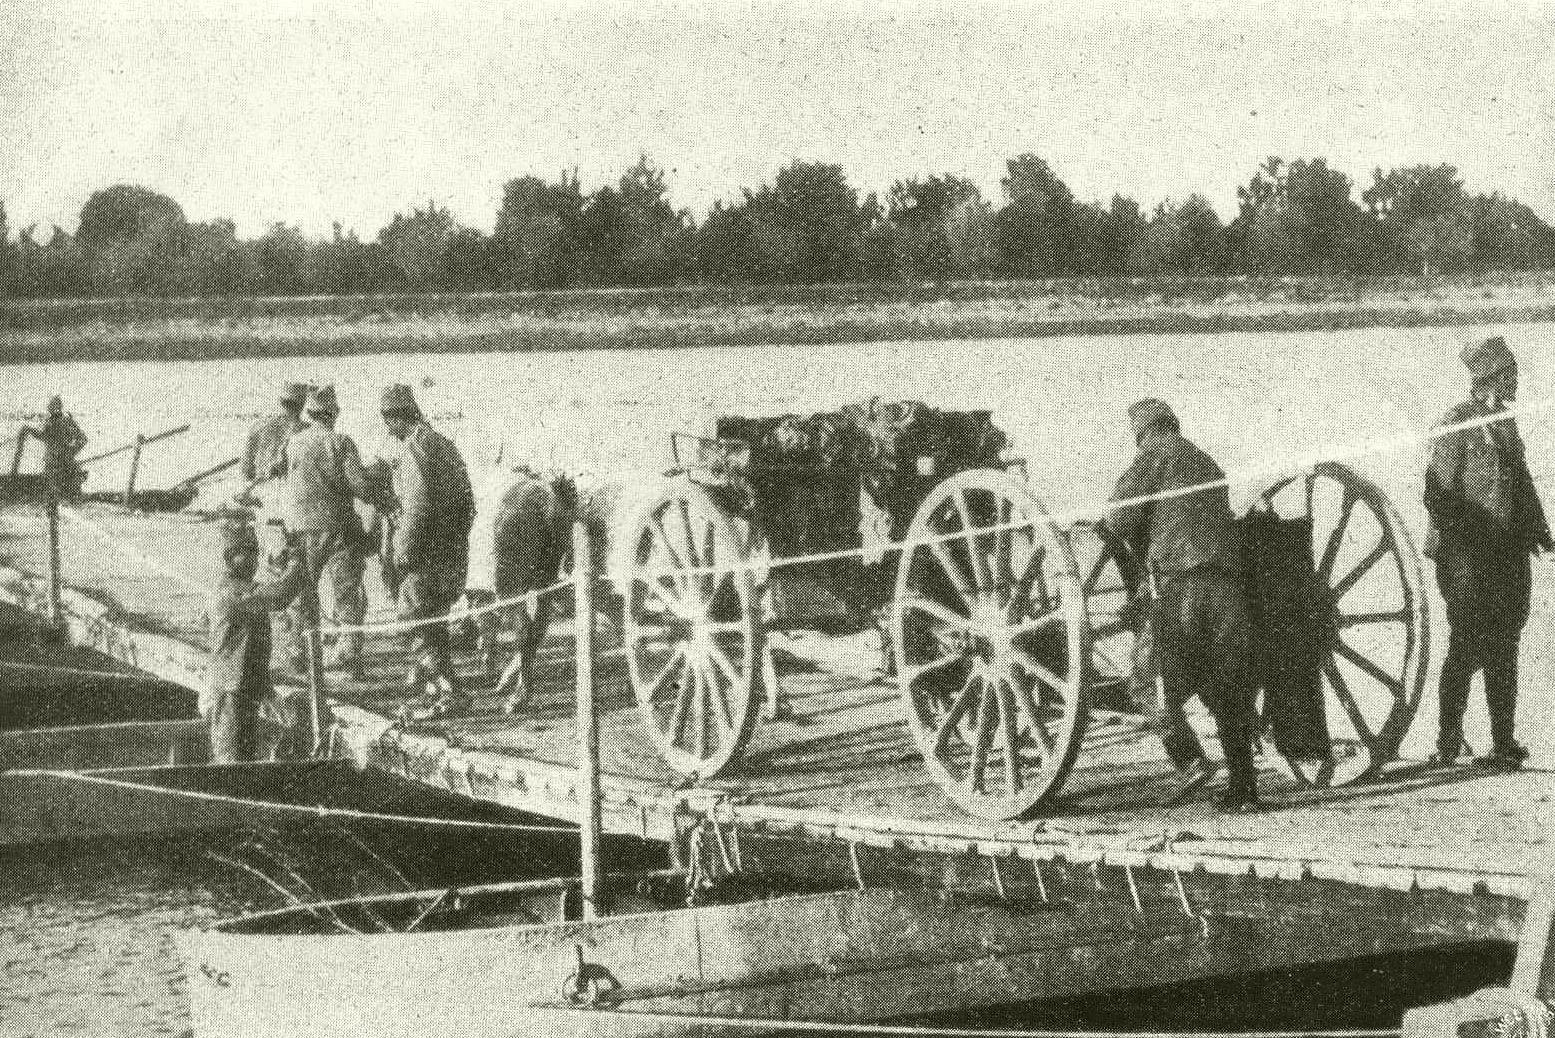 Serb troops crossing a pontoon bridge on the Drina